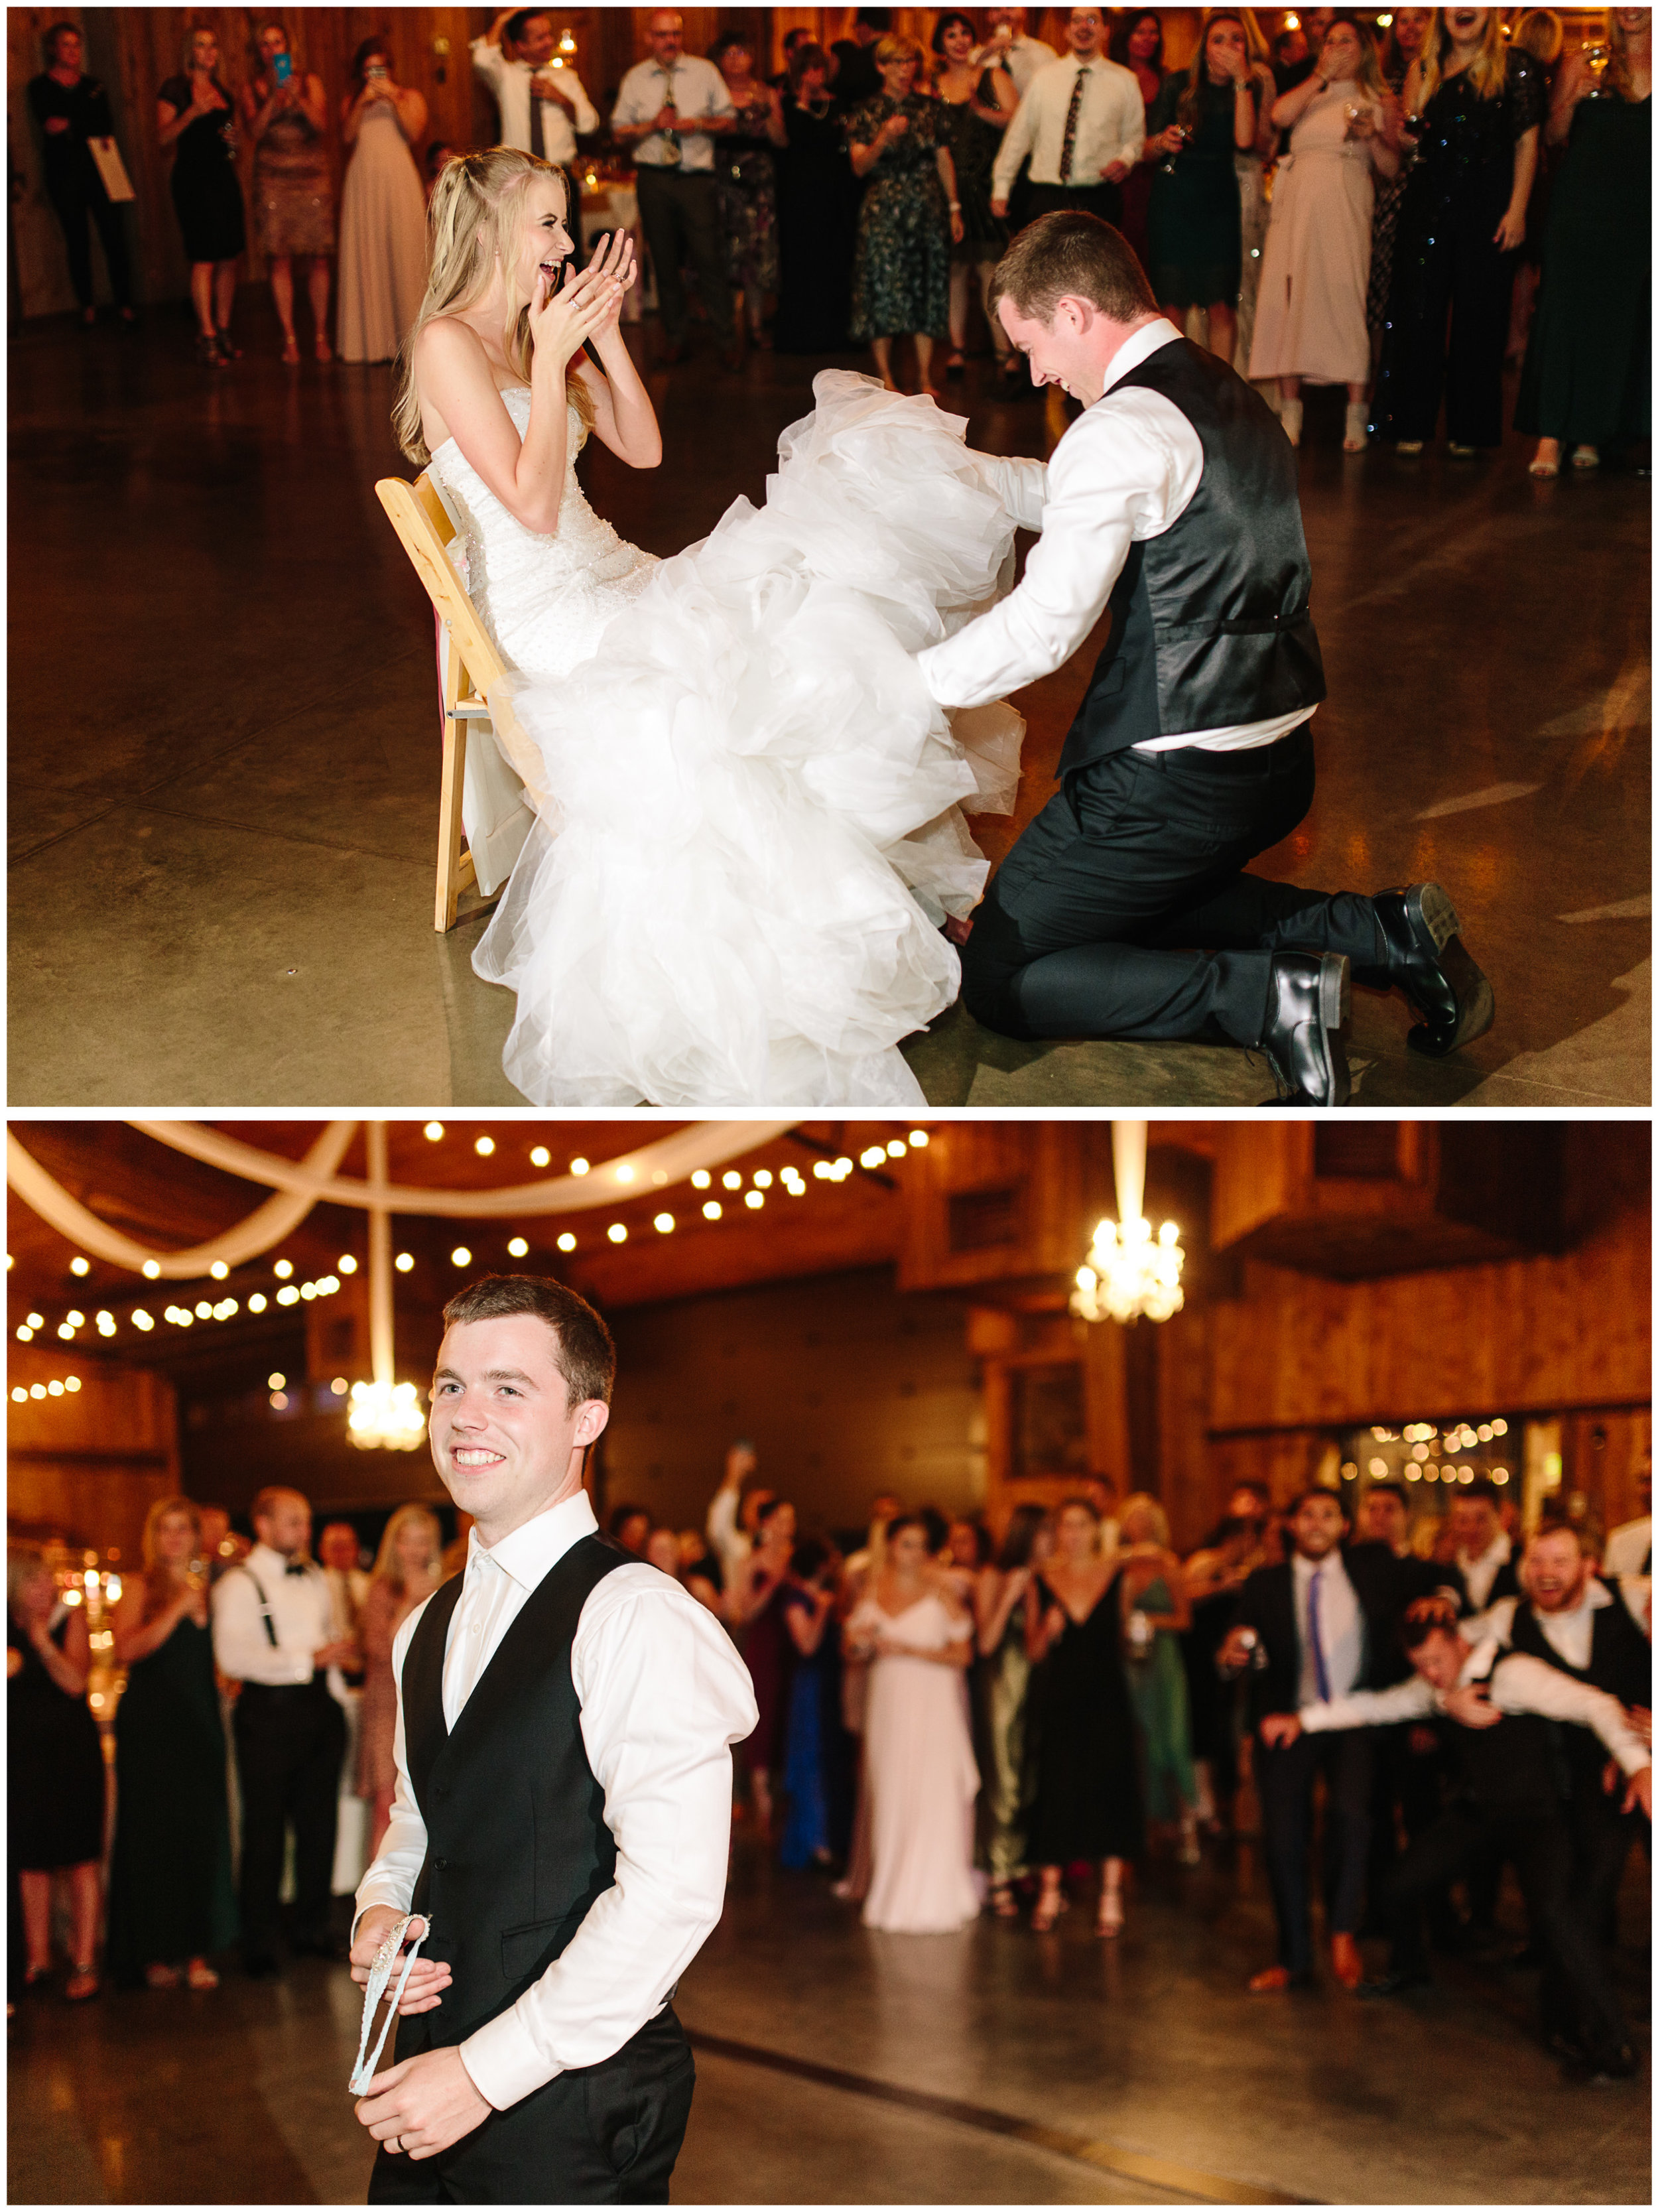 spruce_mountain_ranch_wedding_95.jpg